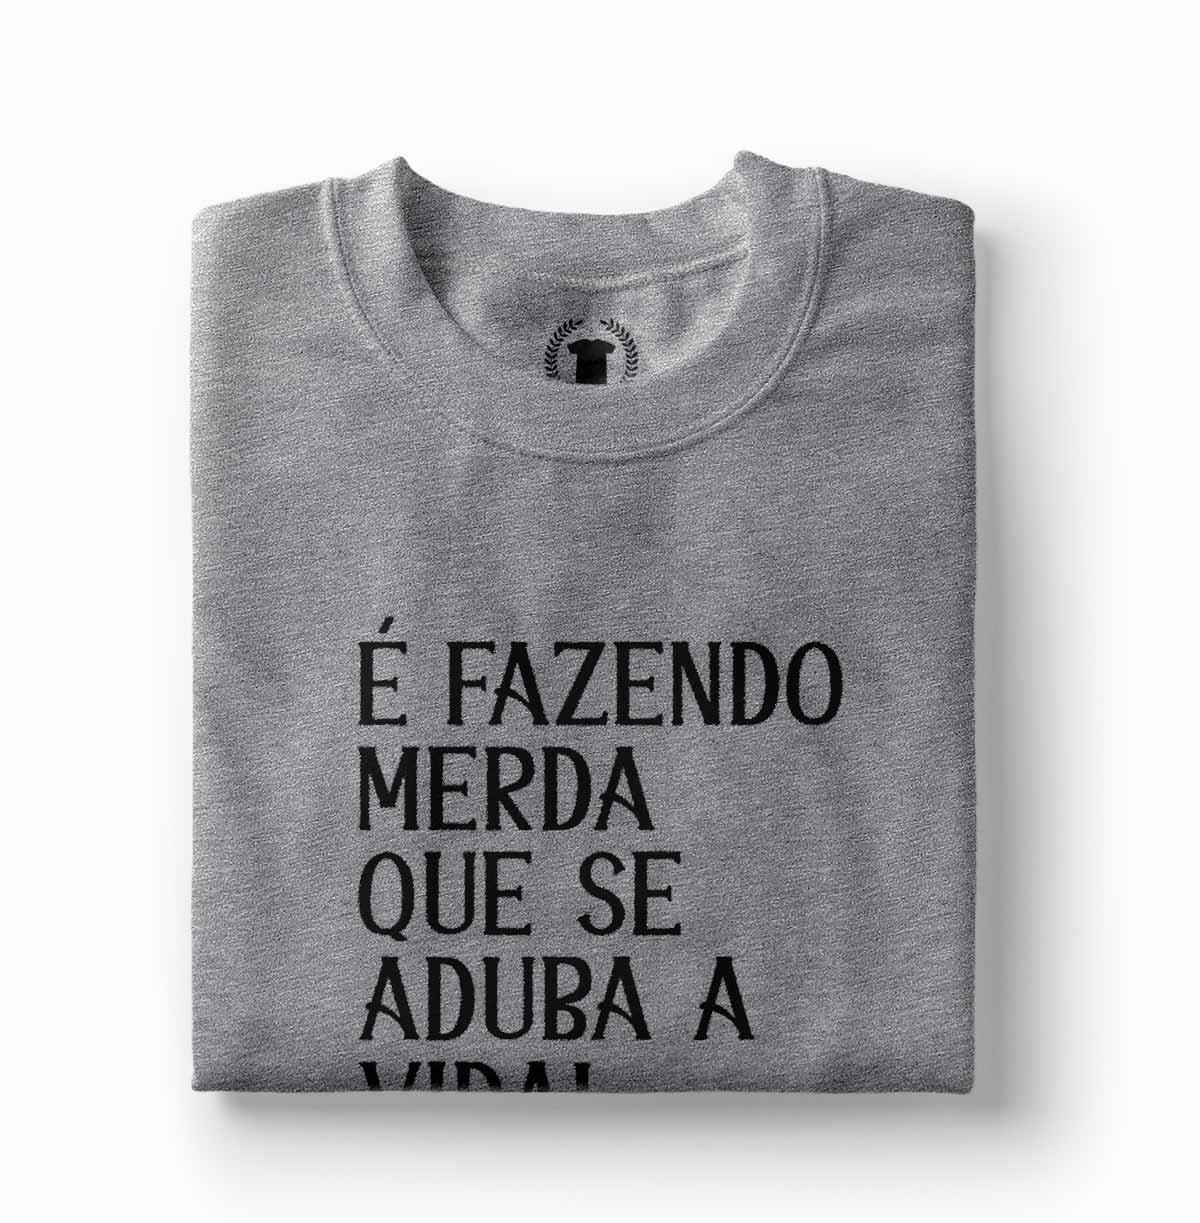 camiseta tumblr feminina fazendo merda que se aduba